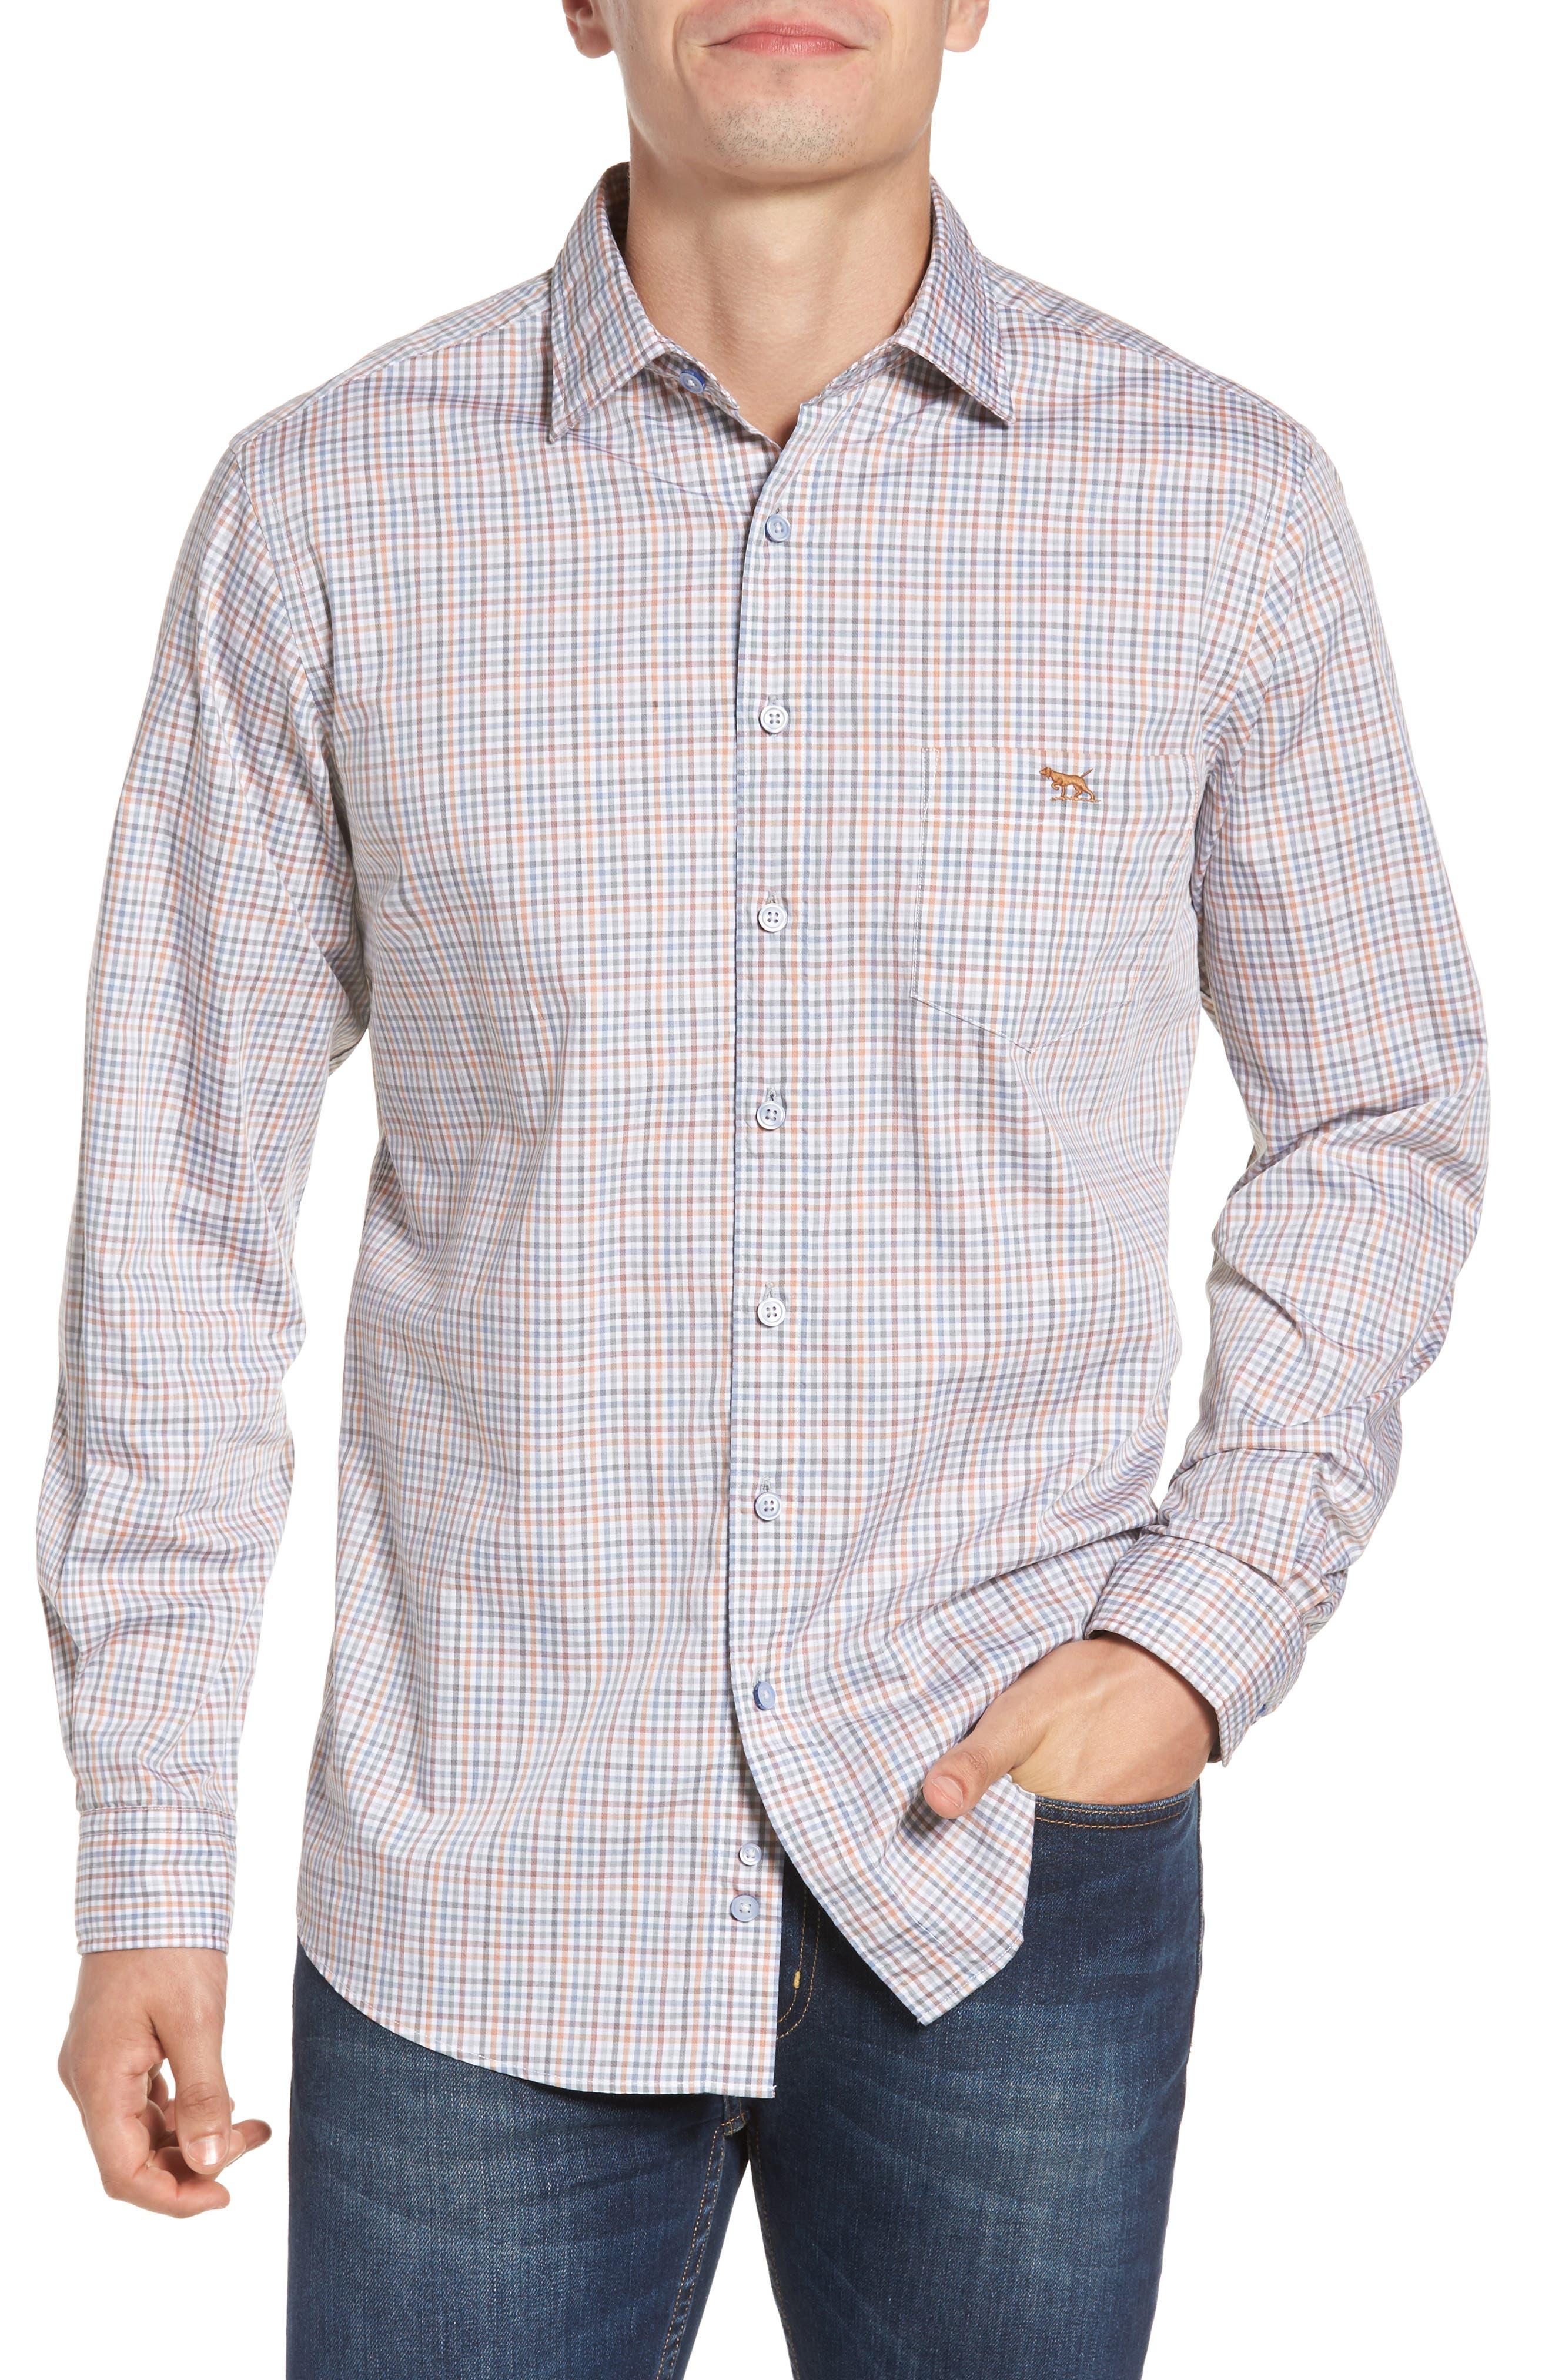 Woodlaw Original Fit Check Sport Shirt,                             Main thumbnail 1, color,